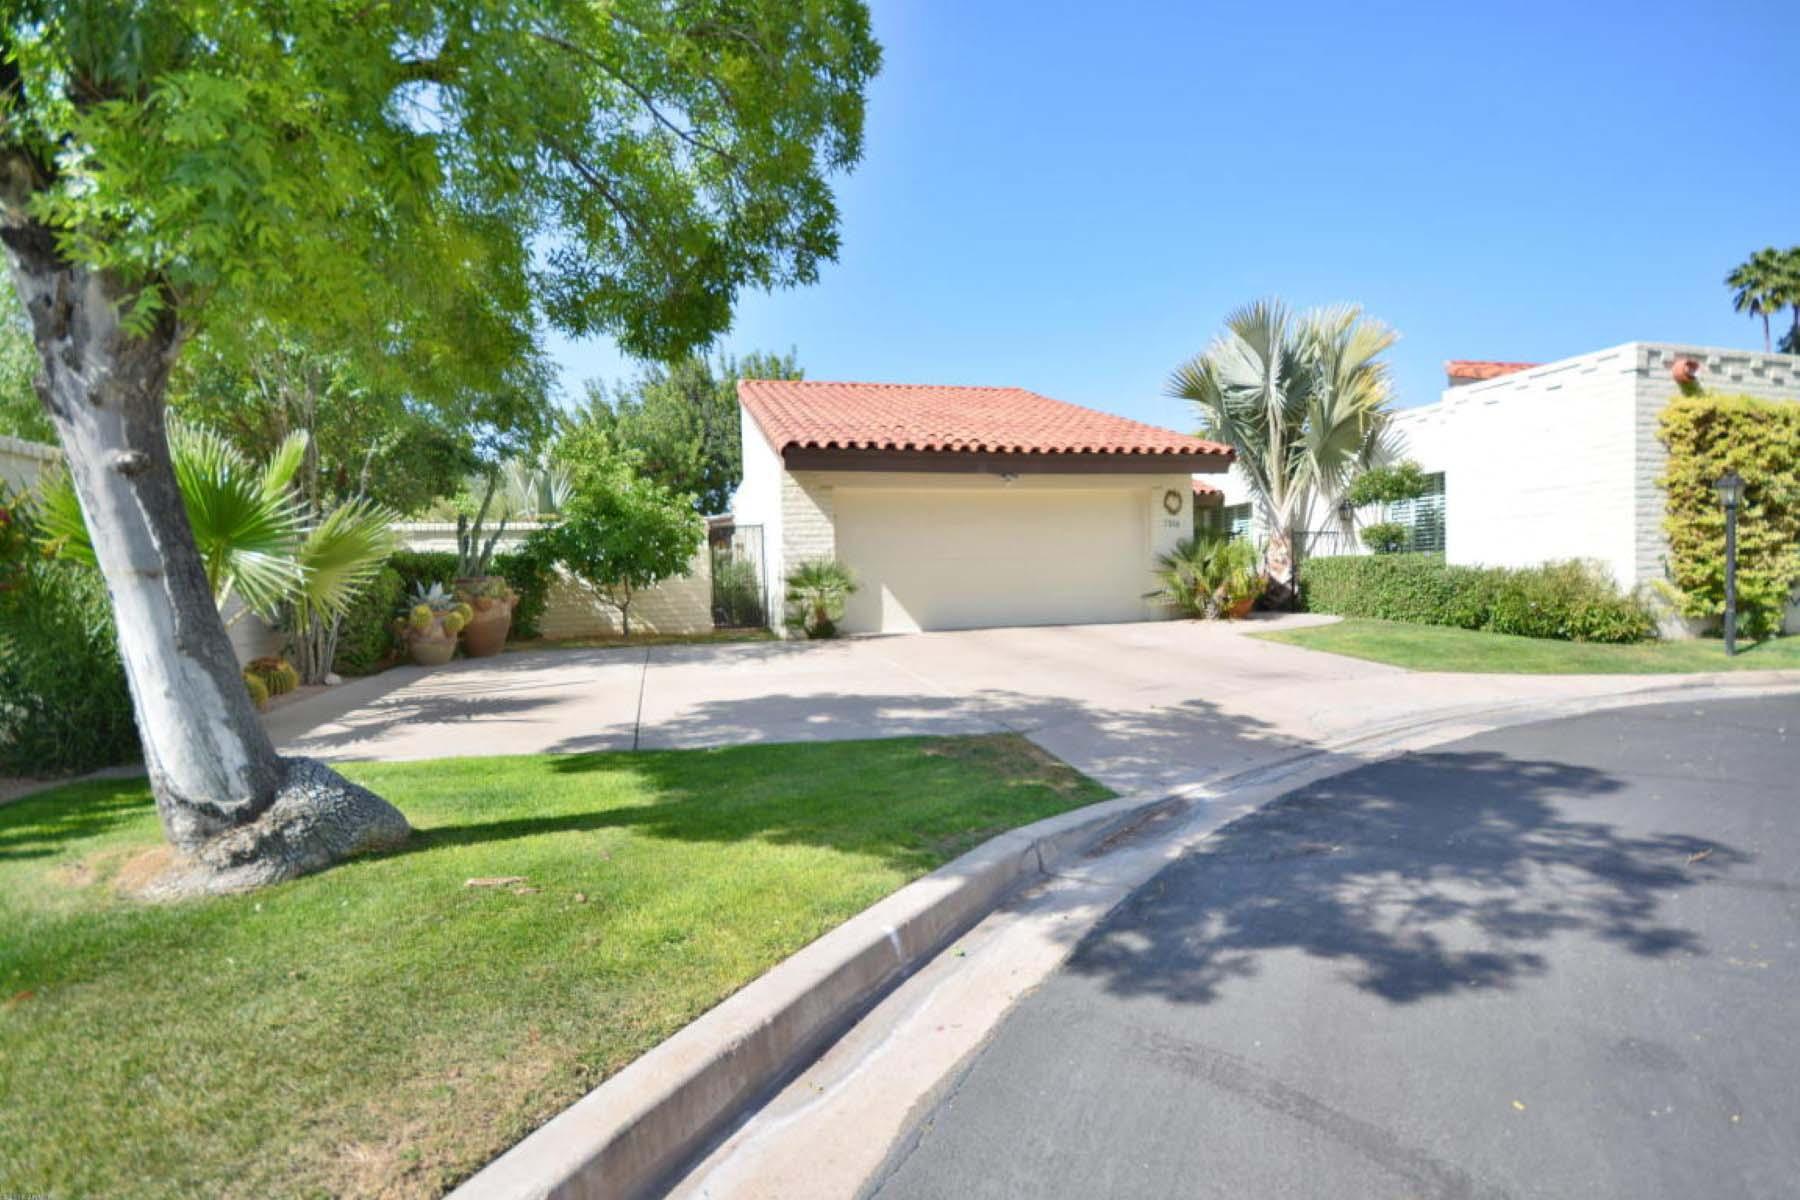 獨棟家庭住宅 為 出售 在 Highly desirable Casabella home. 7316 E SIERRA VISTA DR Scottsdale, 亞利桑那州 85250 美國